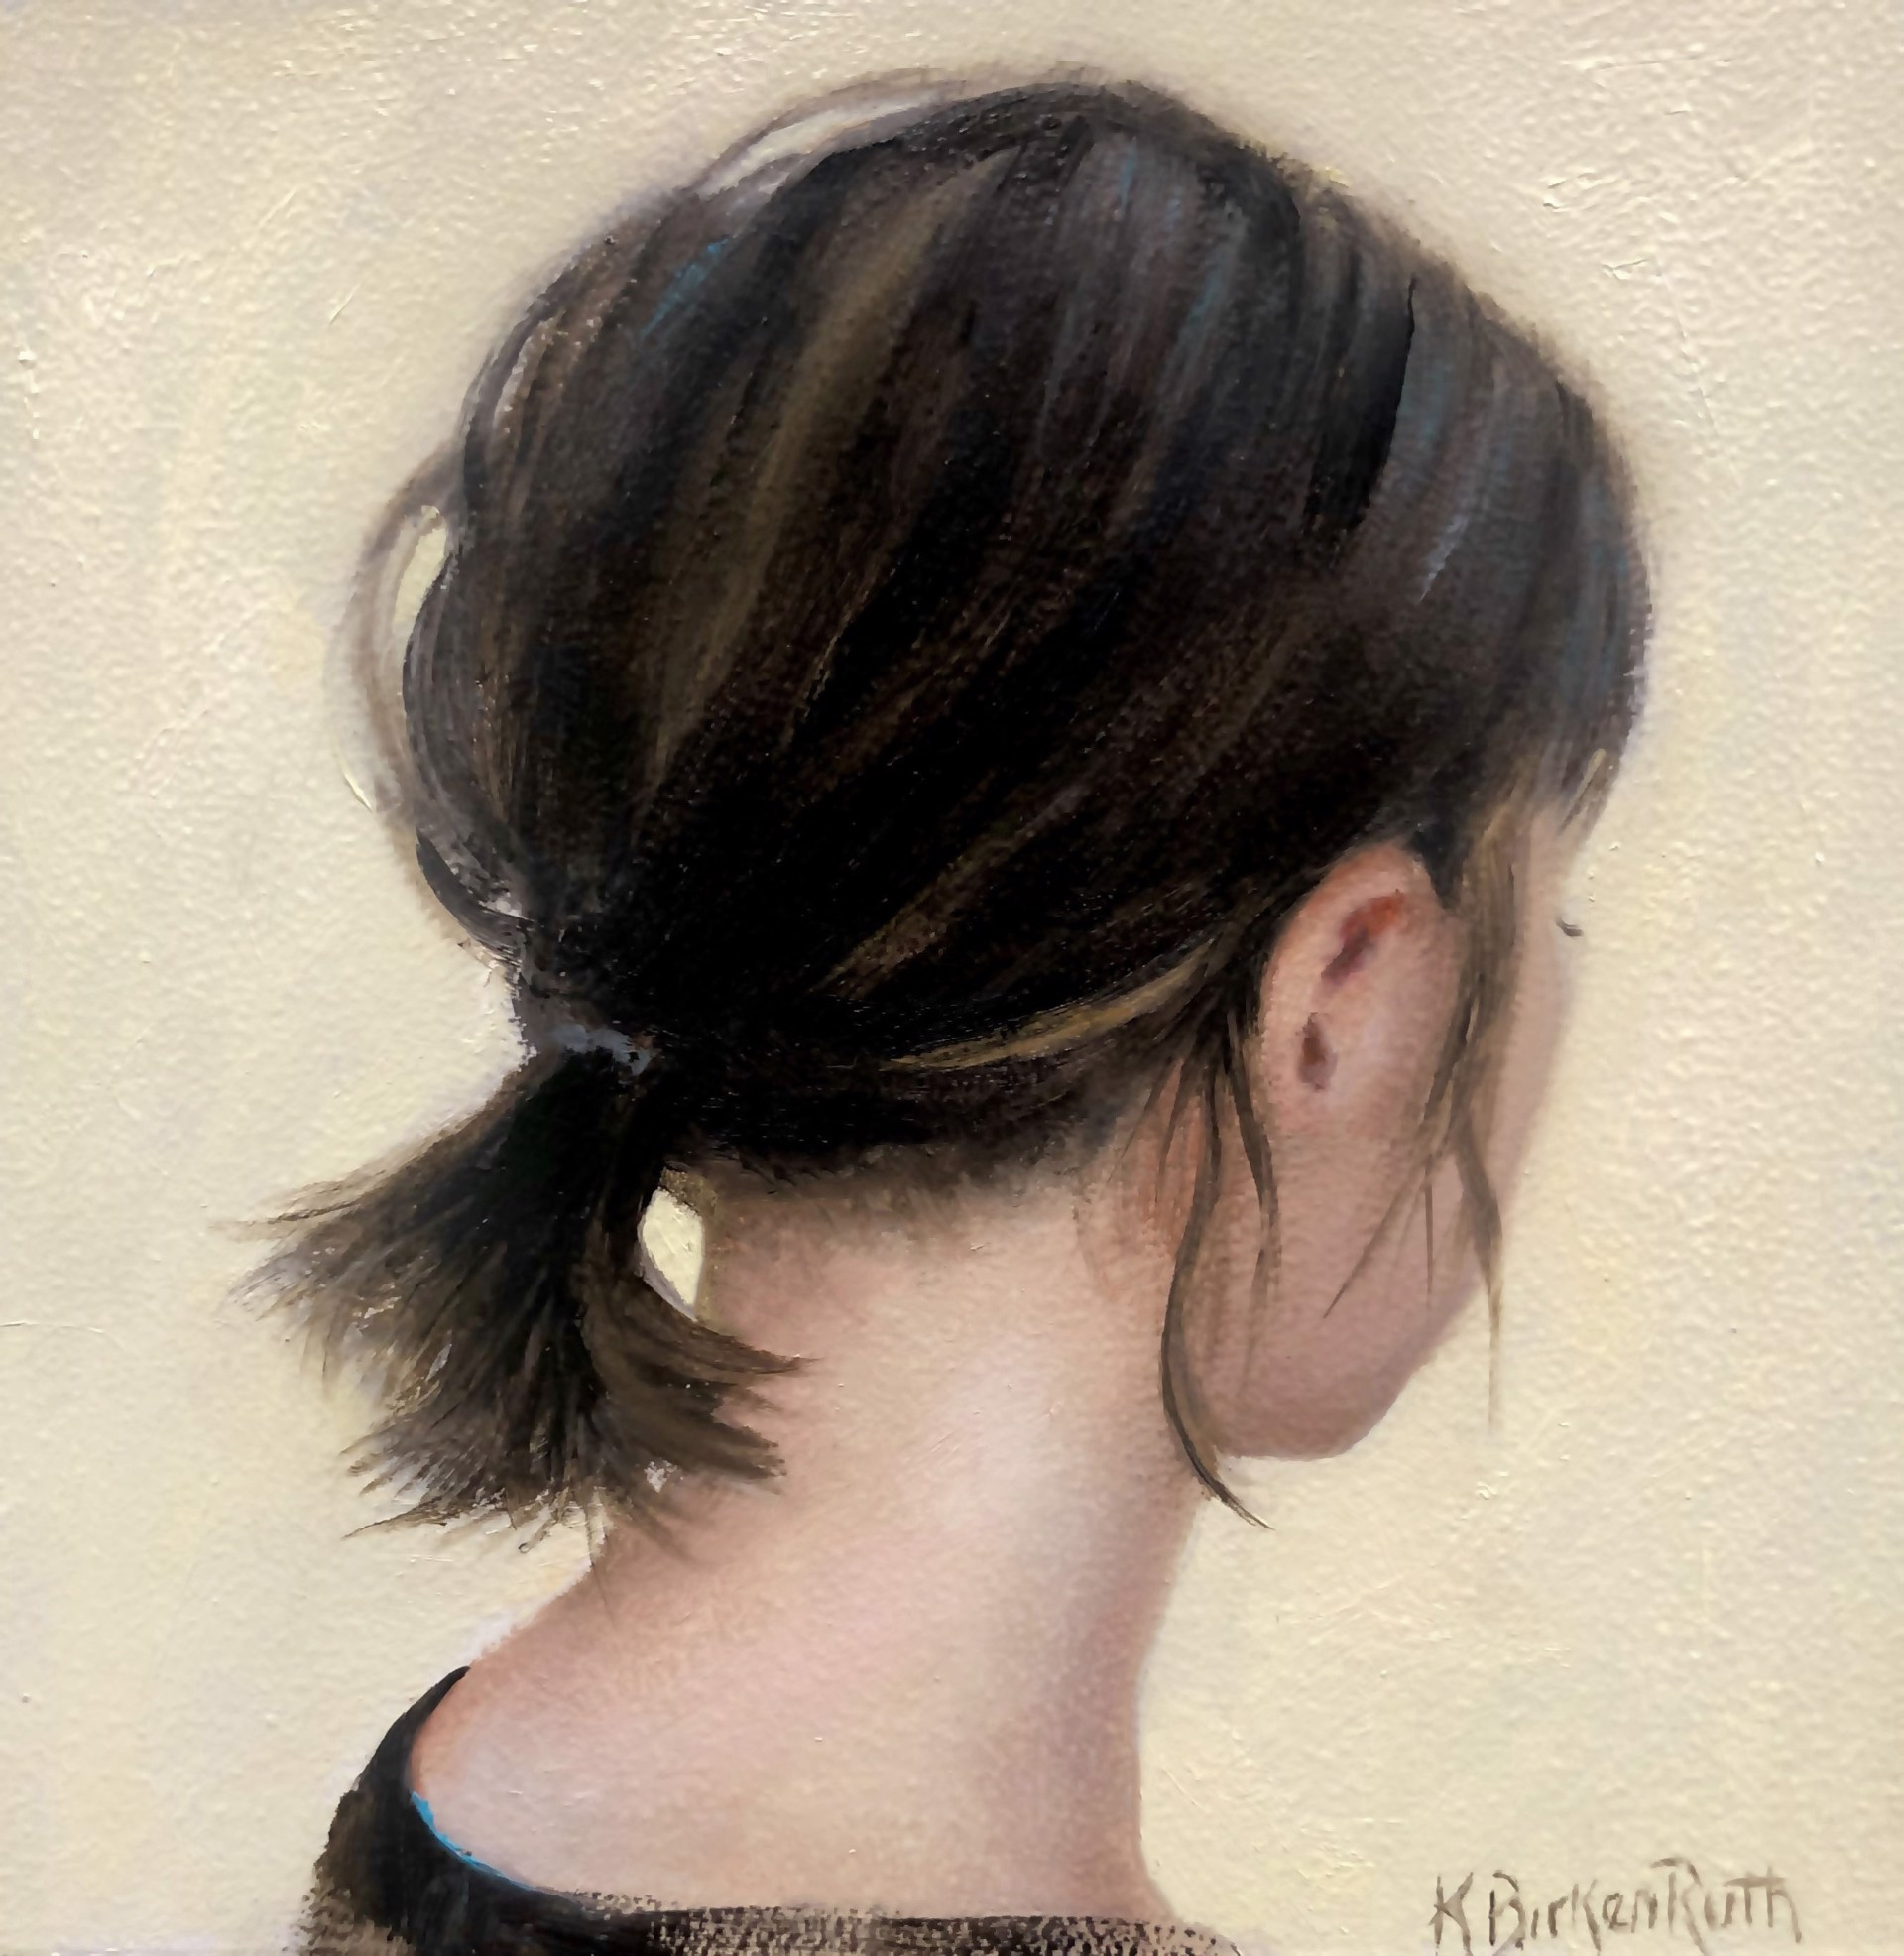 Ponytail by Kelly Birkenruth